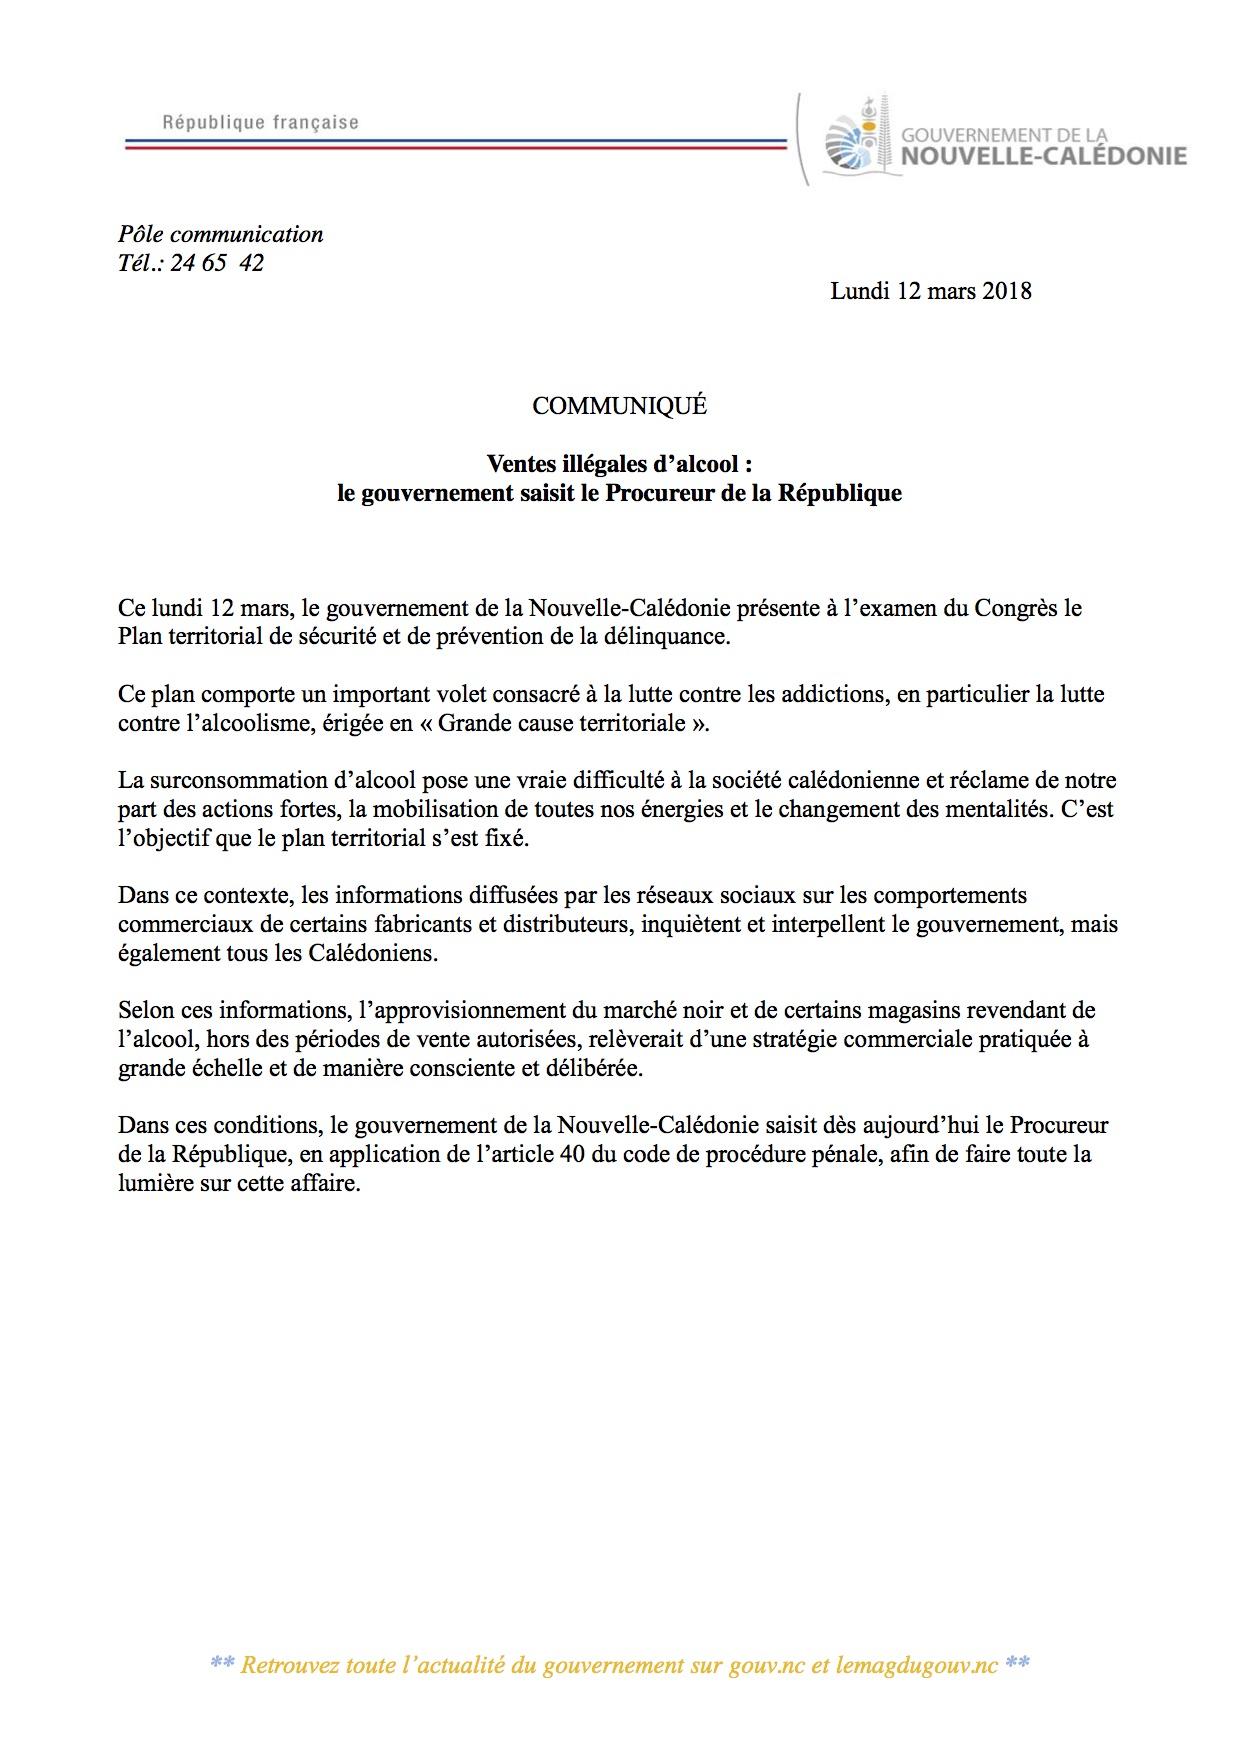 2018-03-12CP-vente-illégale-d27alcool-2